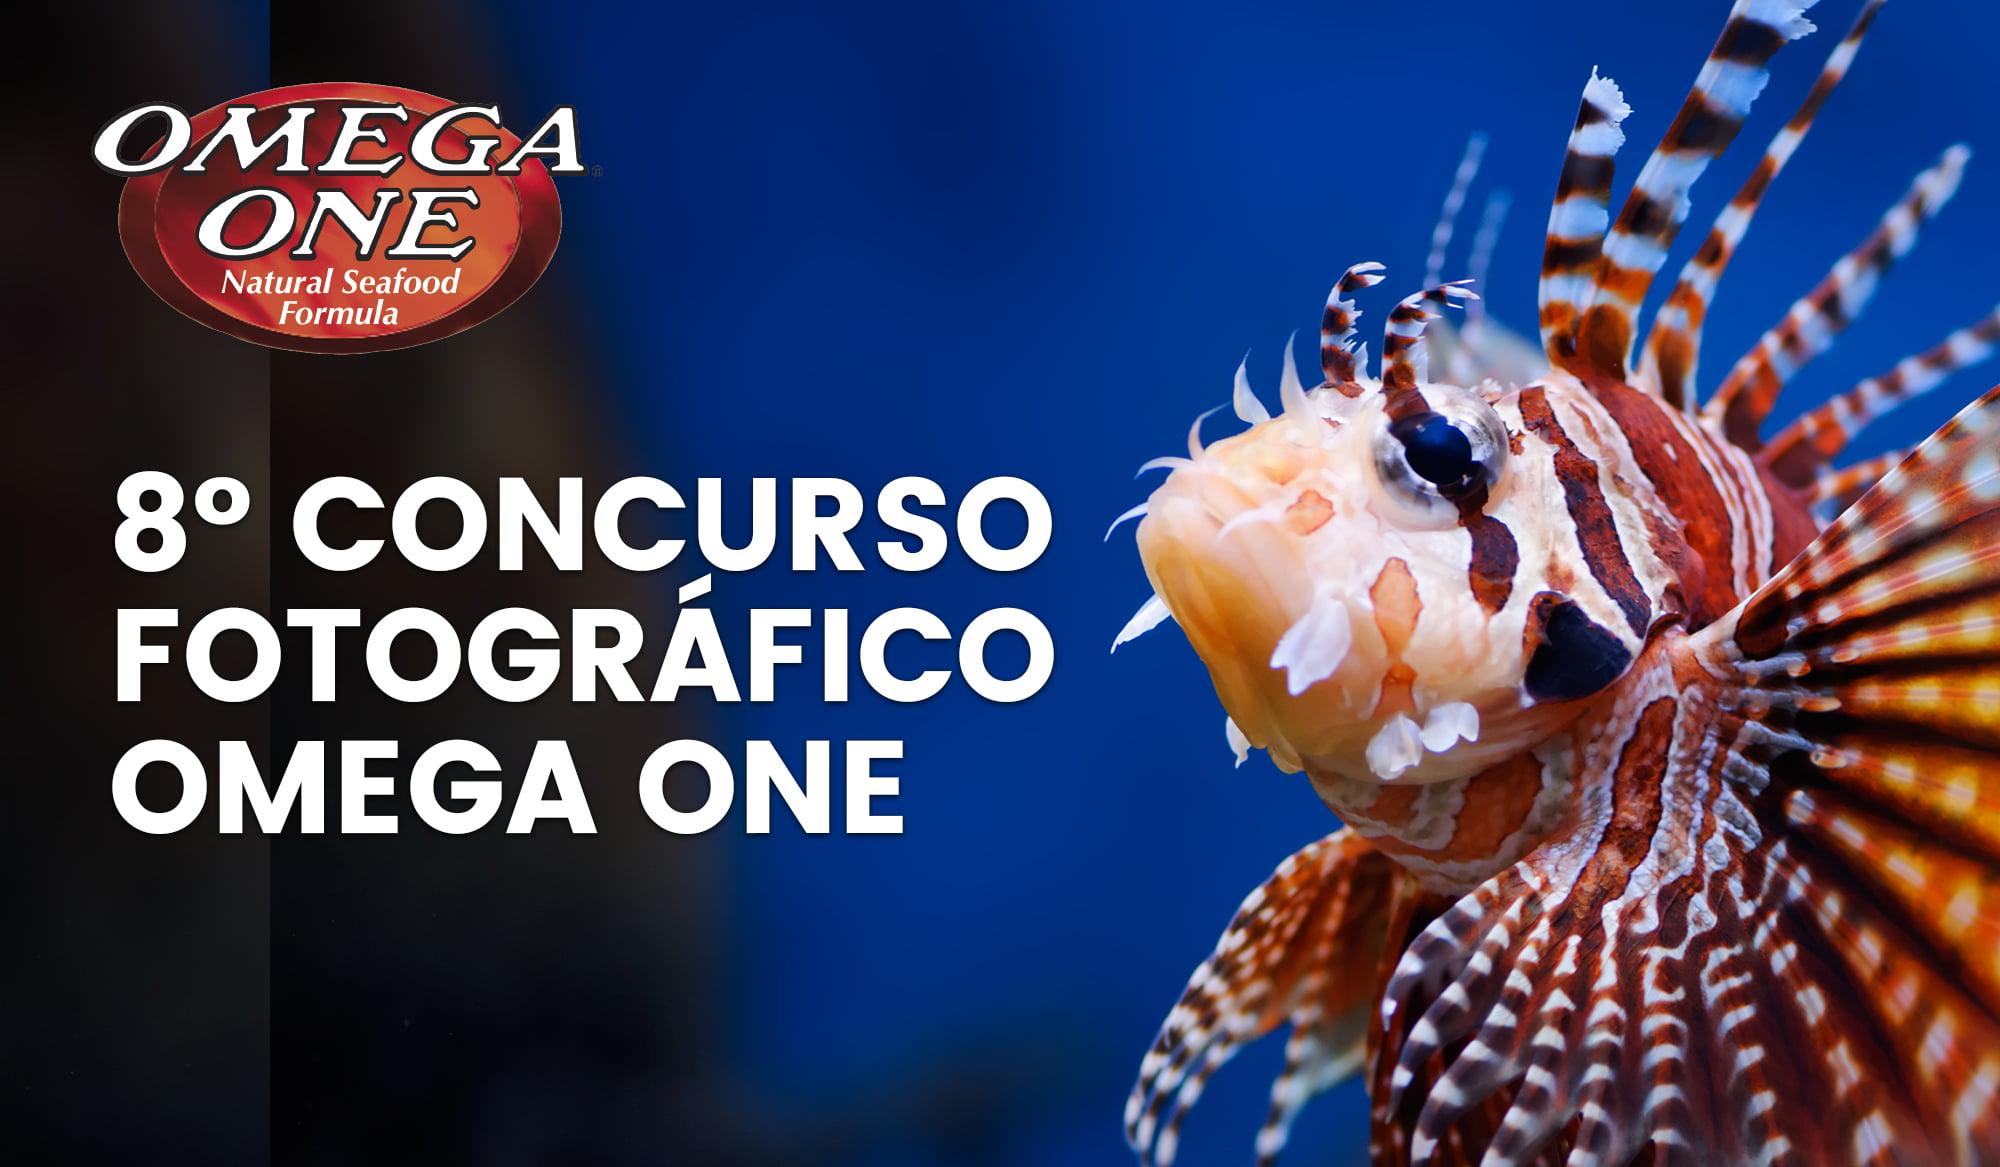 8º Concurso Fotográfico Omega One